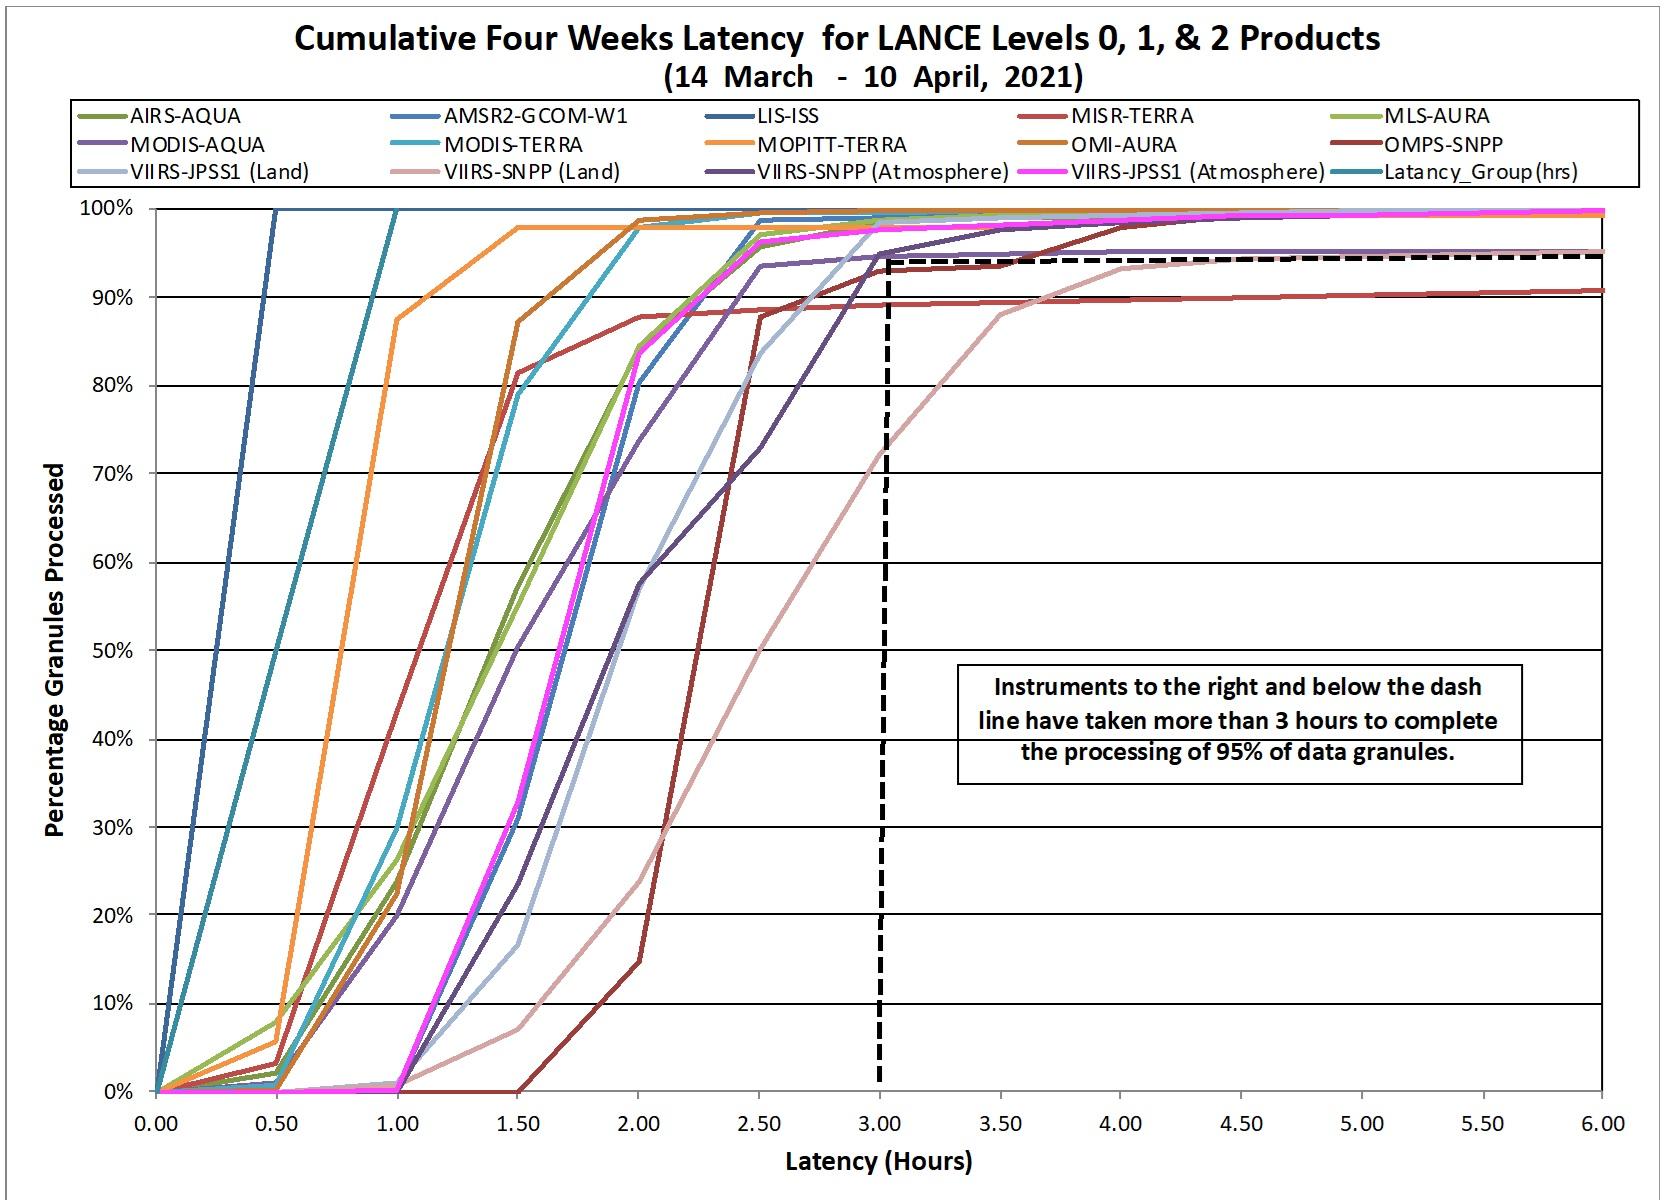 LANCE Metrics 2 1-14-21